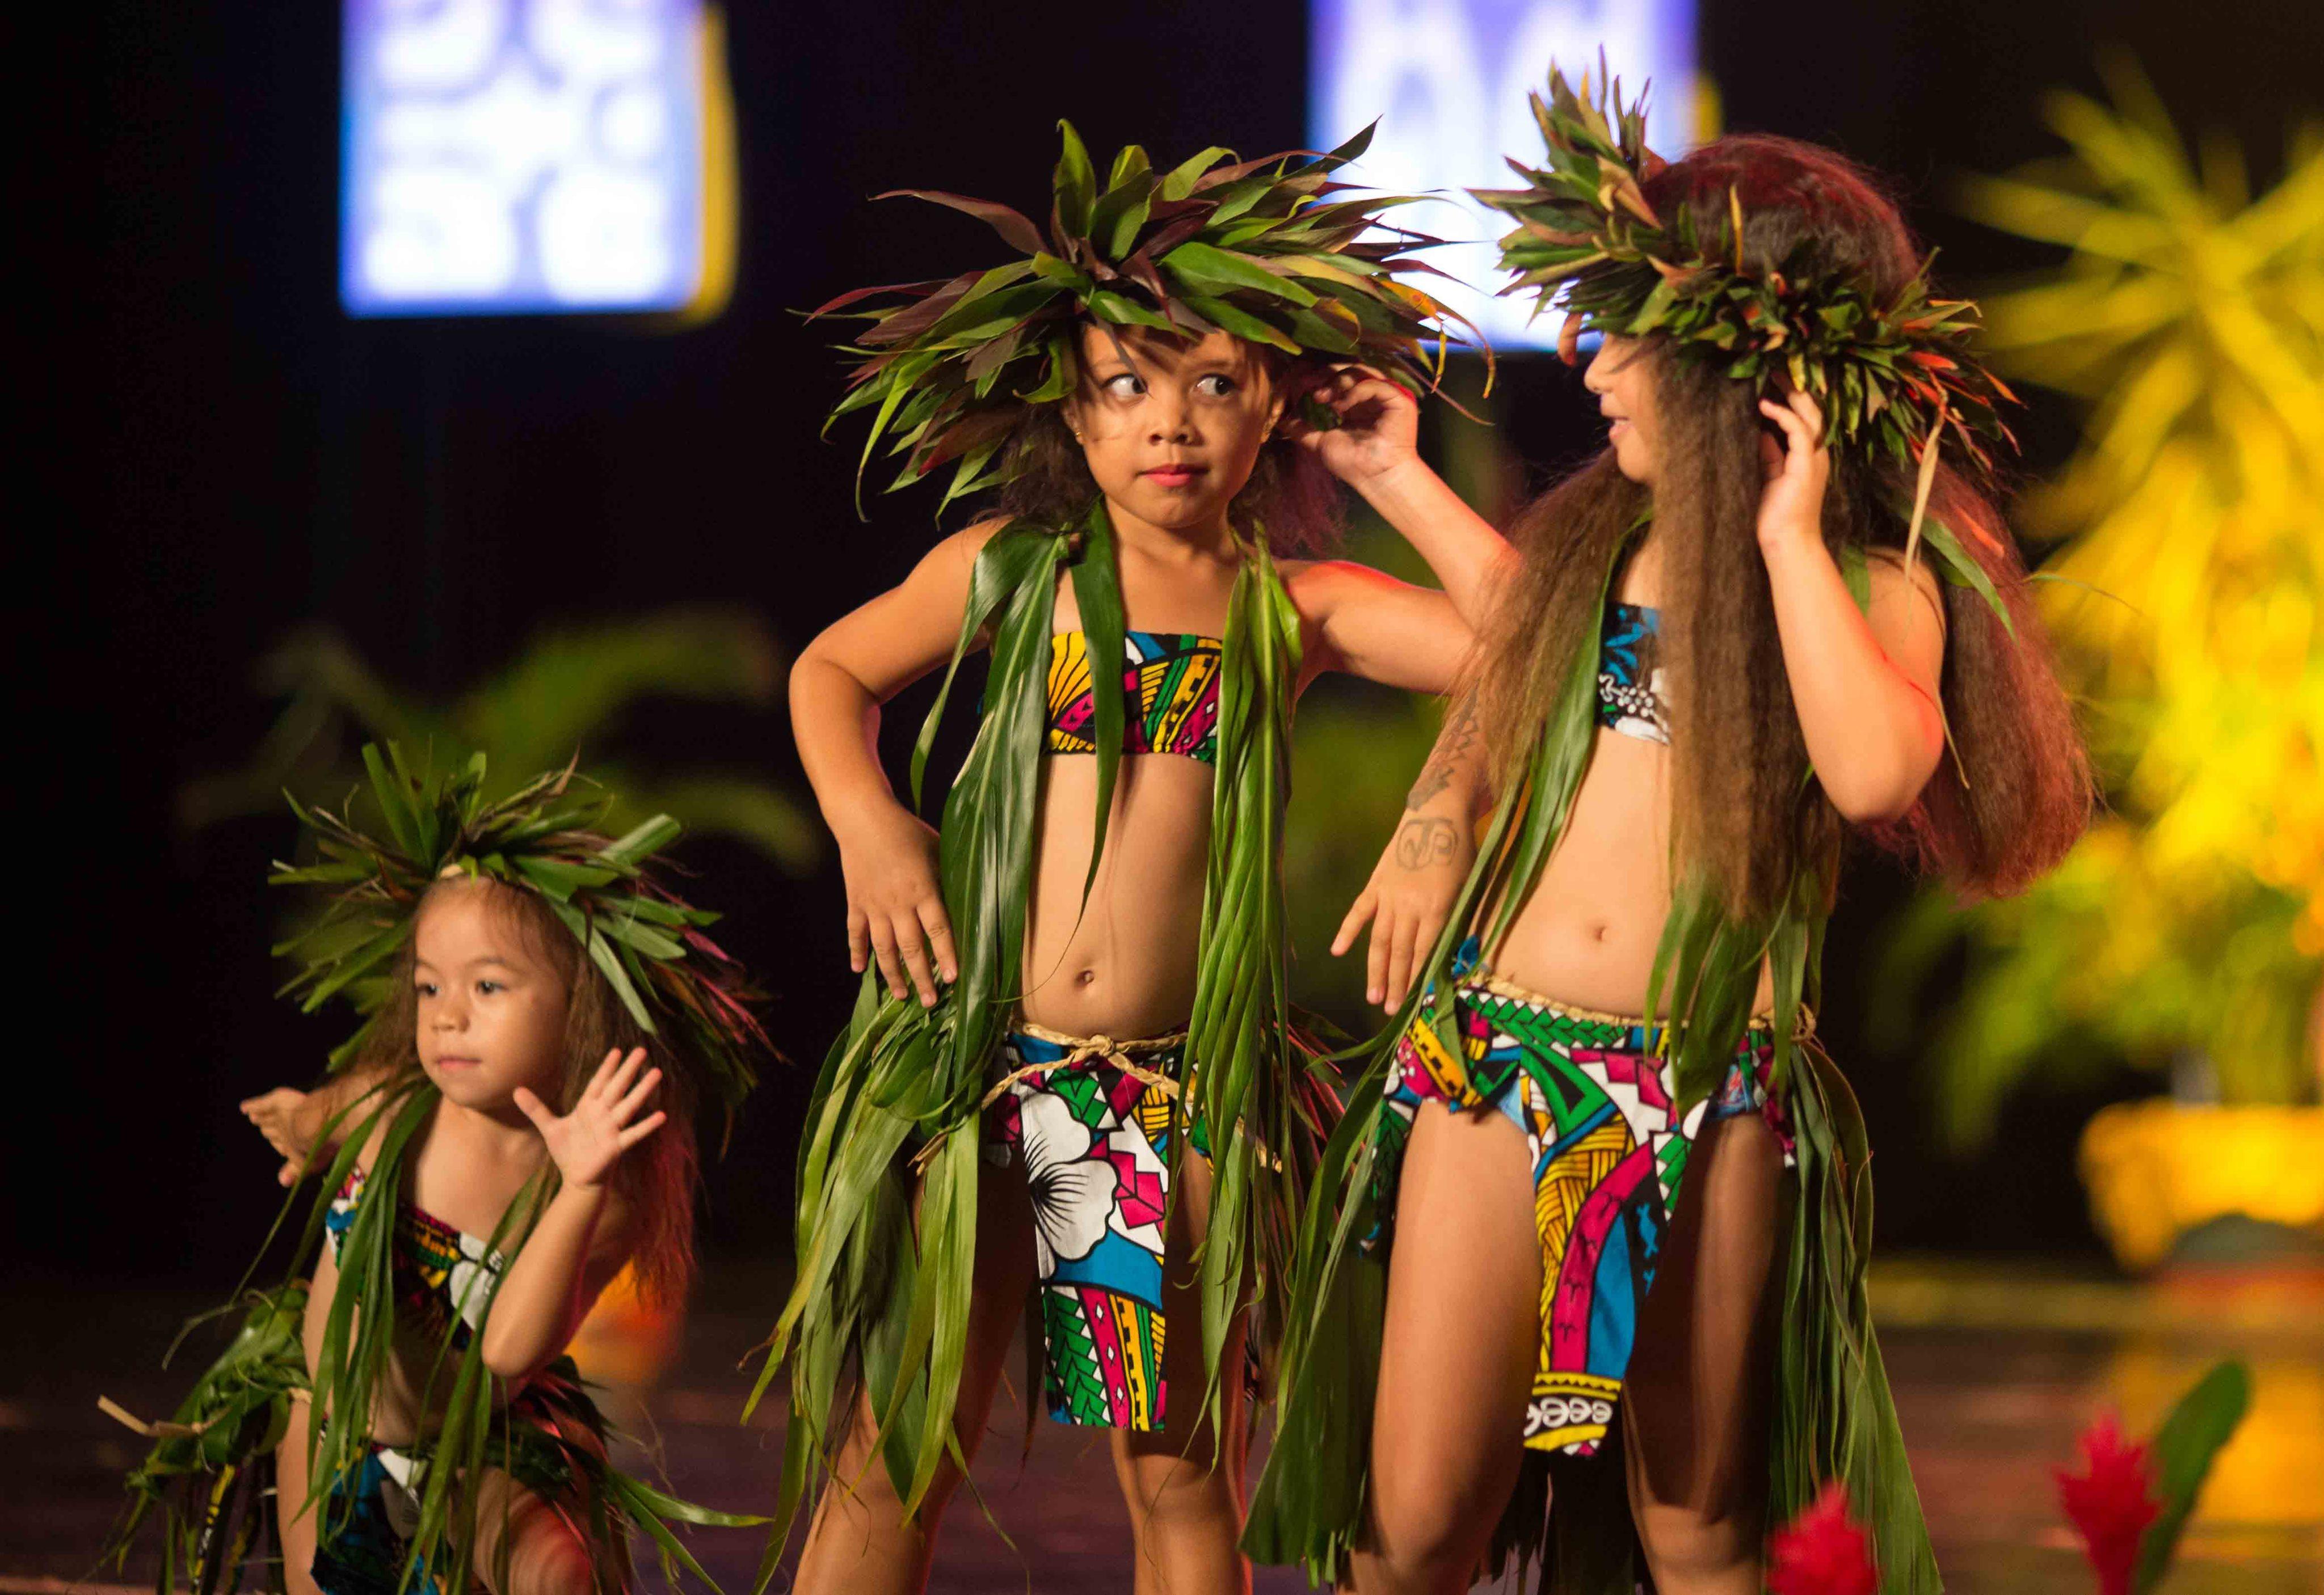 Carnet de voyage – TAHITI – Le Heiva i Tahiti, vitrine de la culture polynésienne